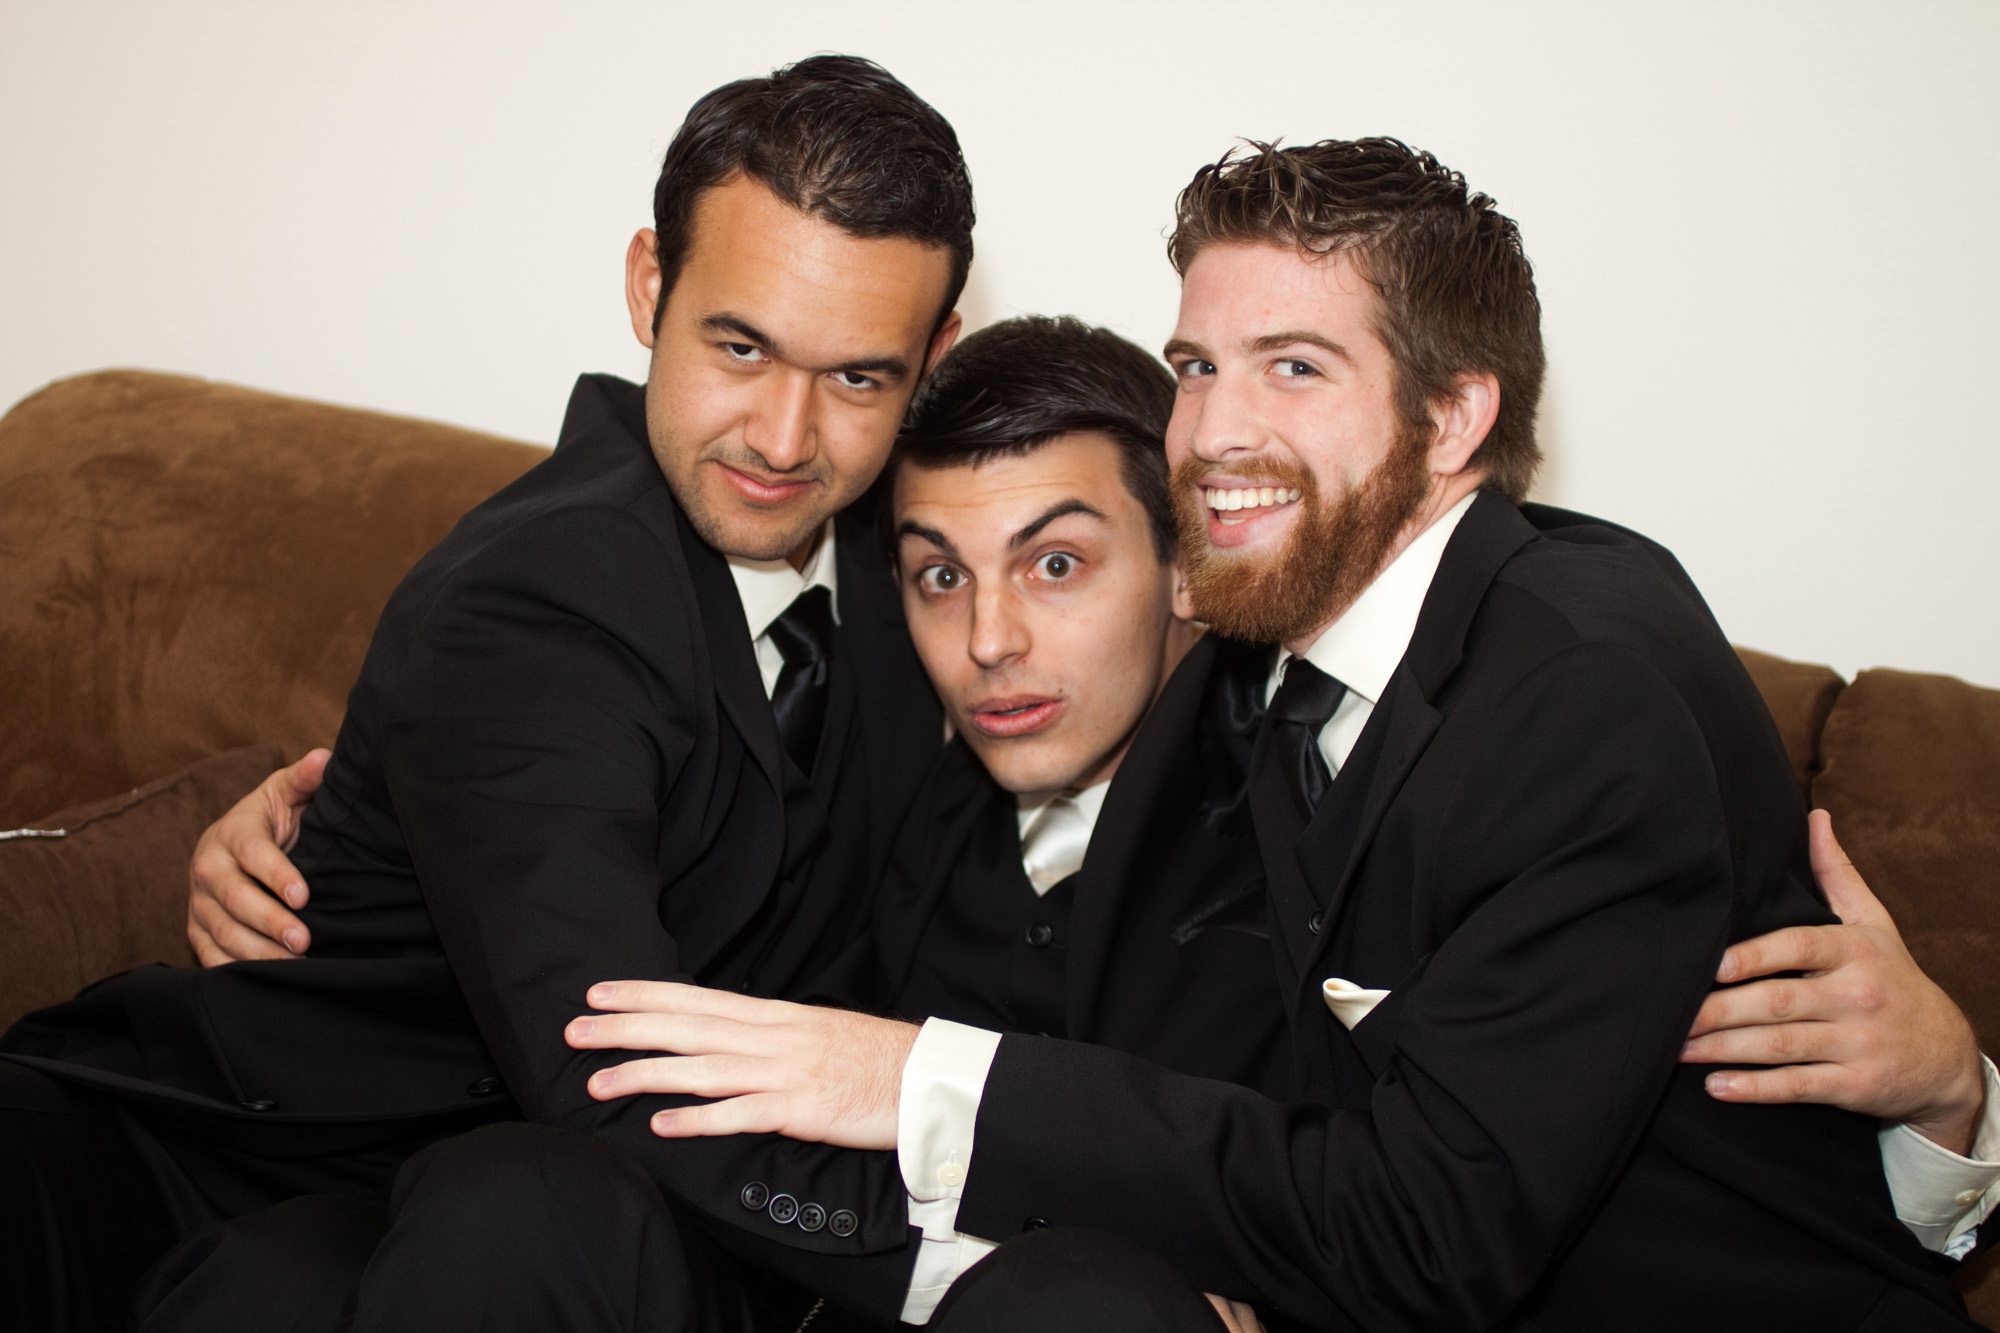 Groomsmen silly photo